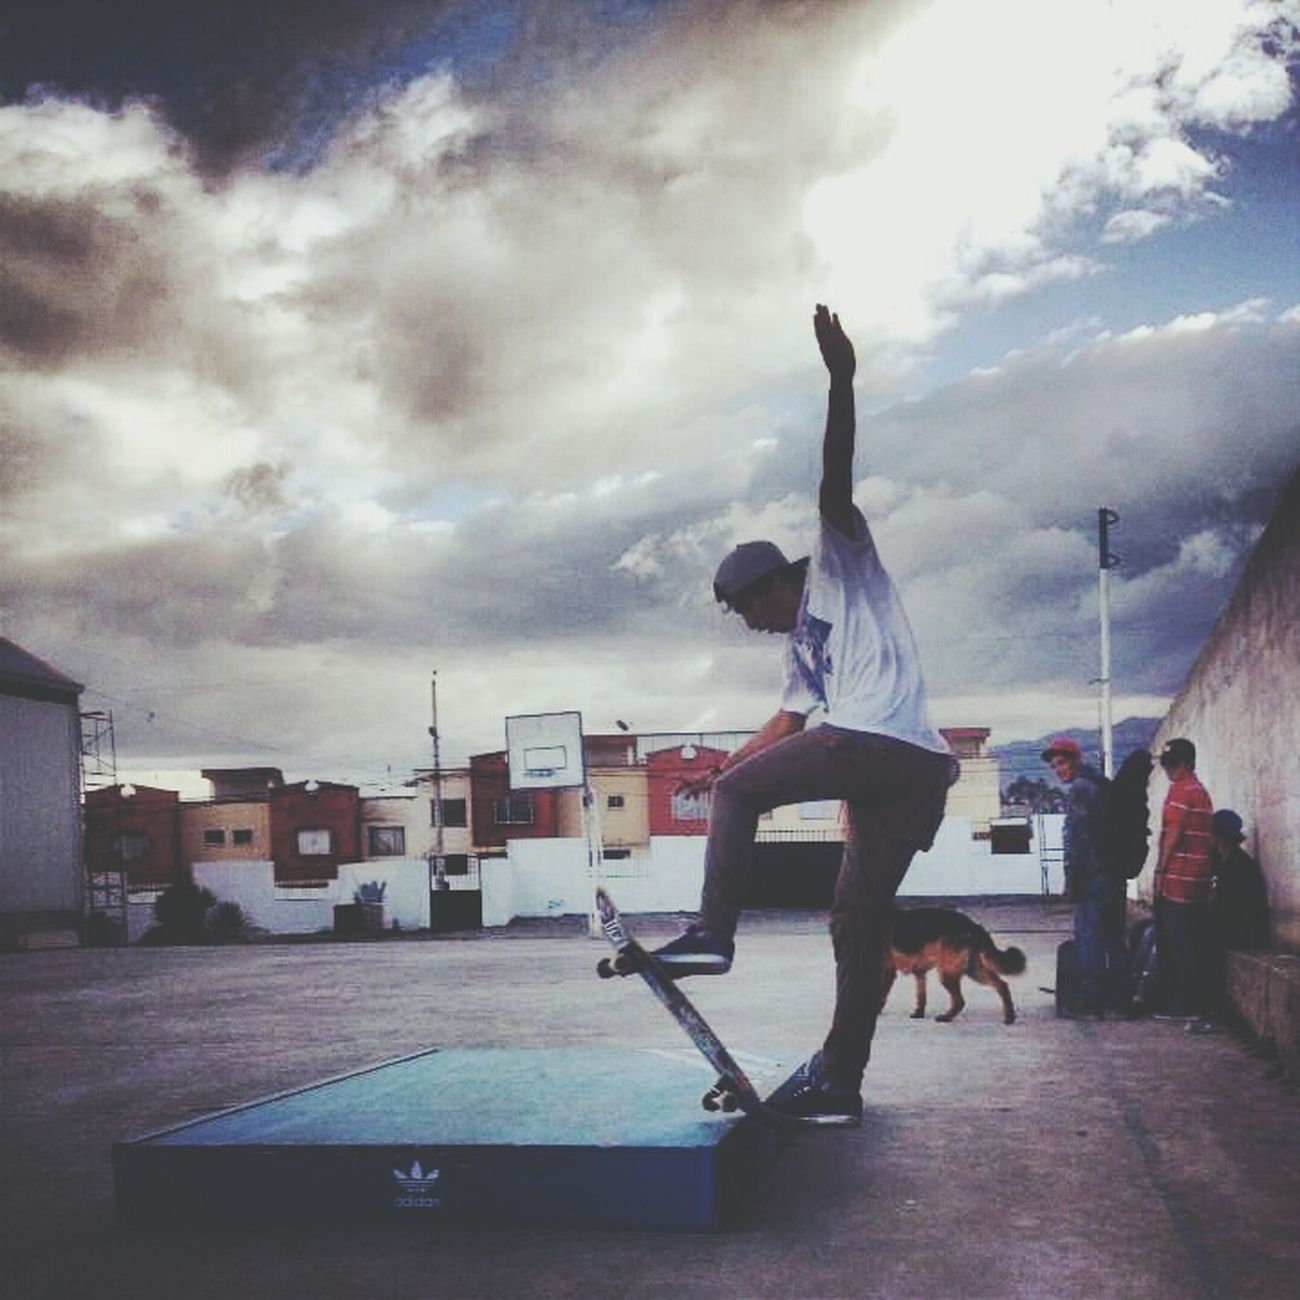 my frontblunt! Yeahskate Skateboarding Larocaskatechurch Frontblunt